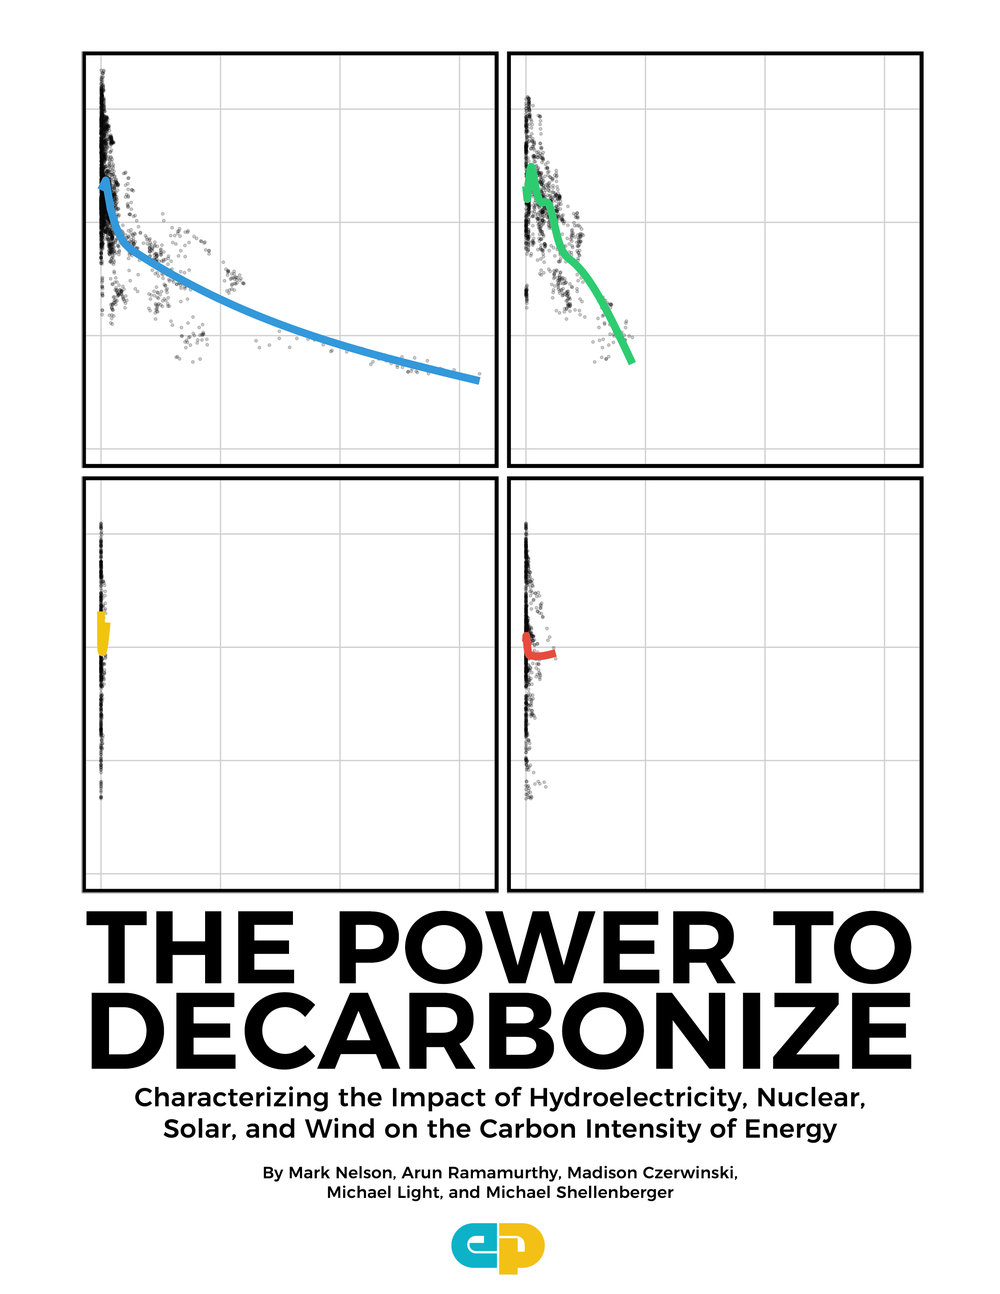 decarbonize-cover-v9.jpg